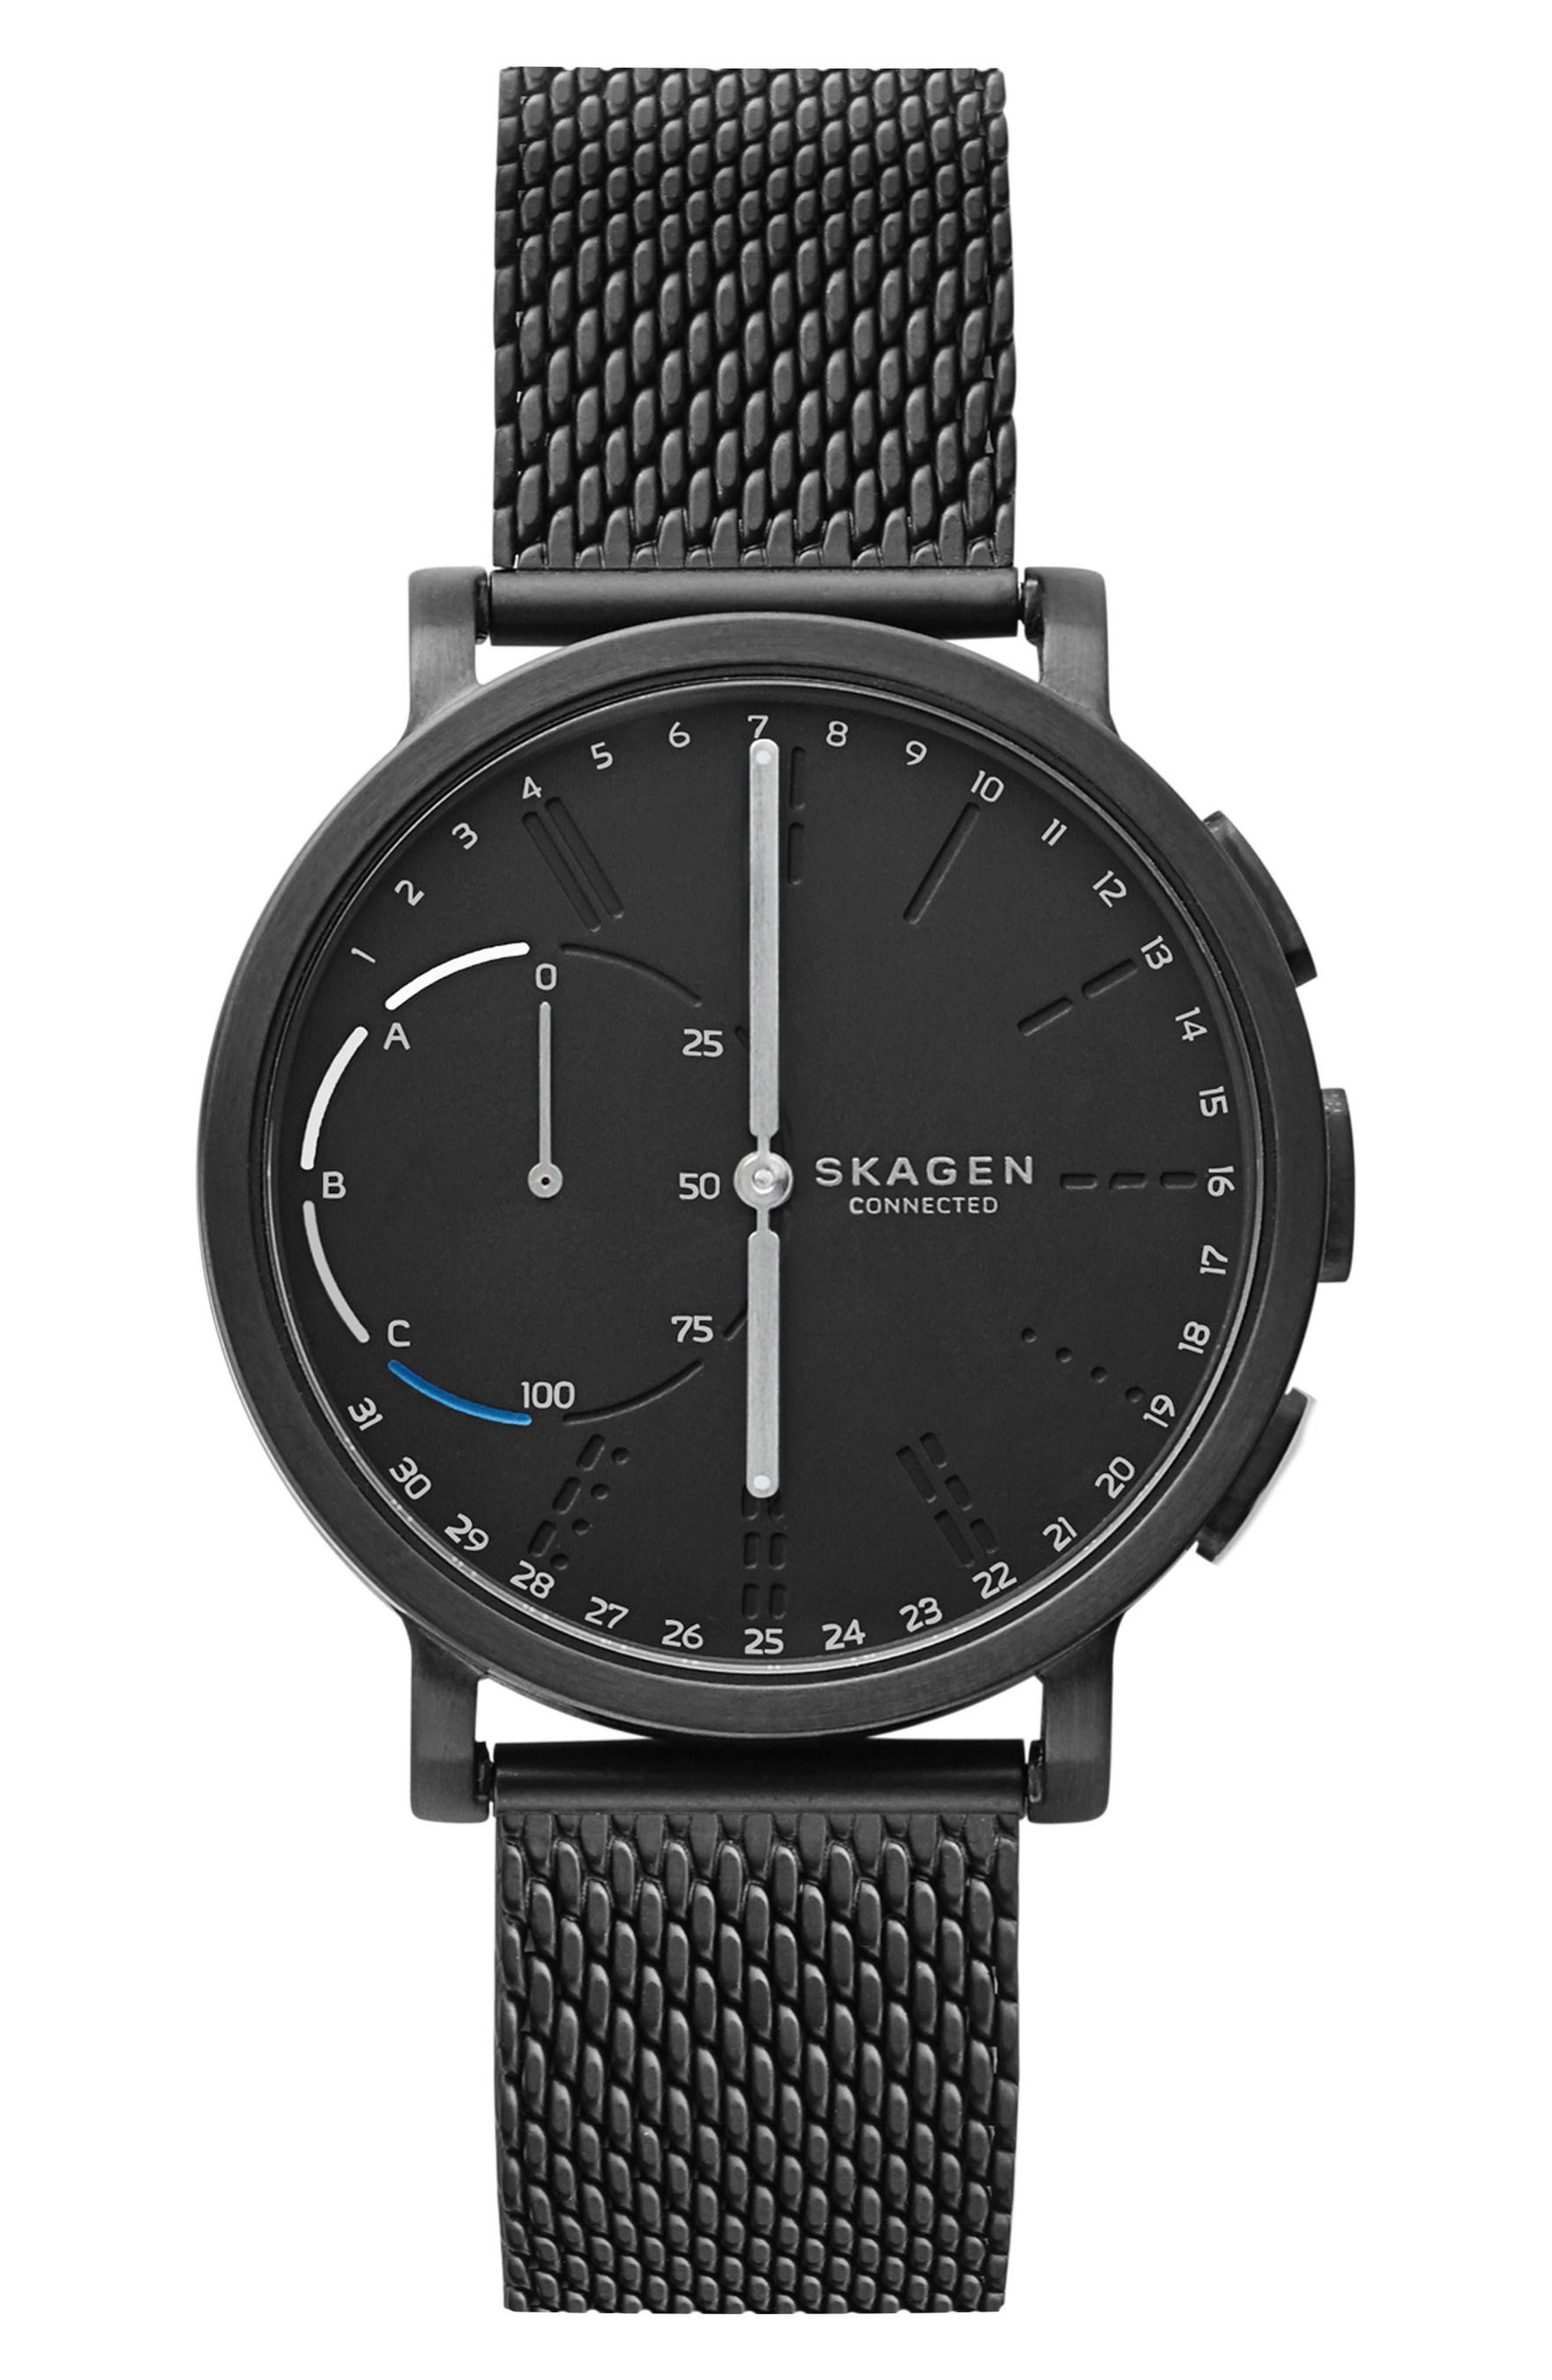 Main Image - Skagen Hagen Connected Mesh Strap Hybrid Smart Watch, 42mm